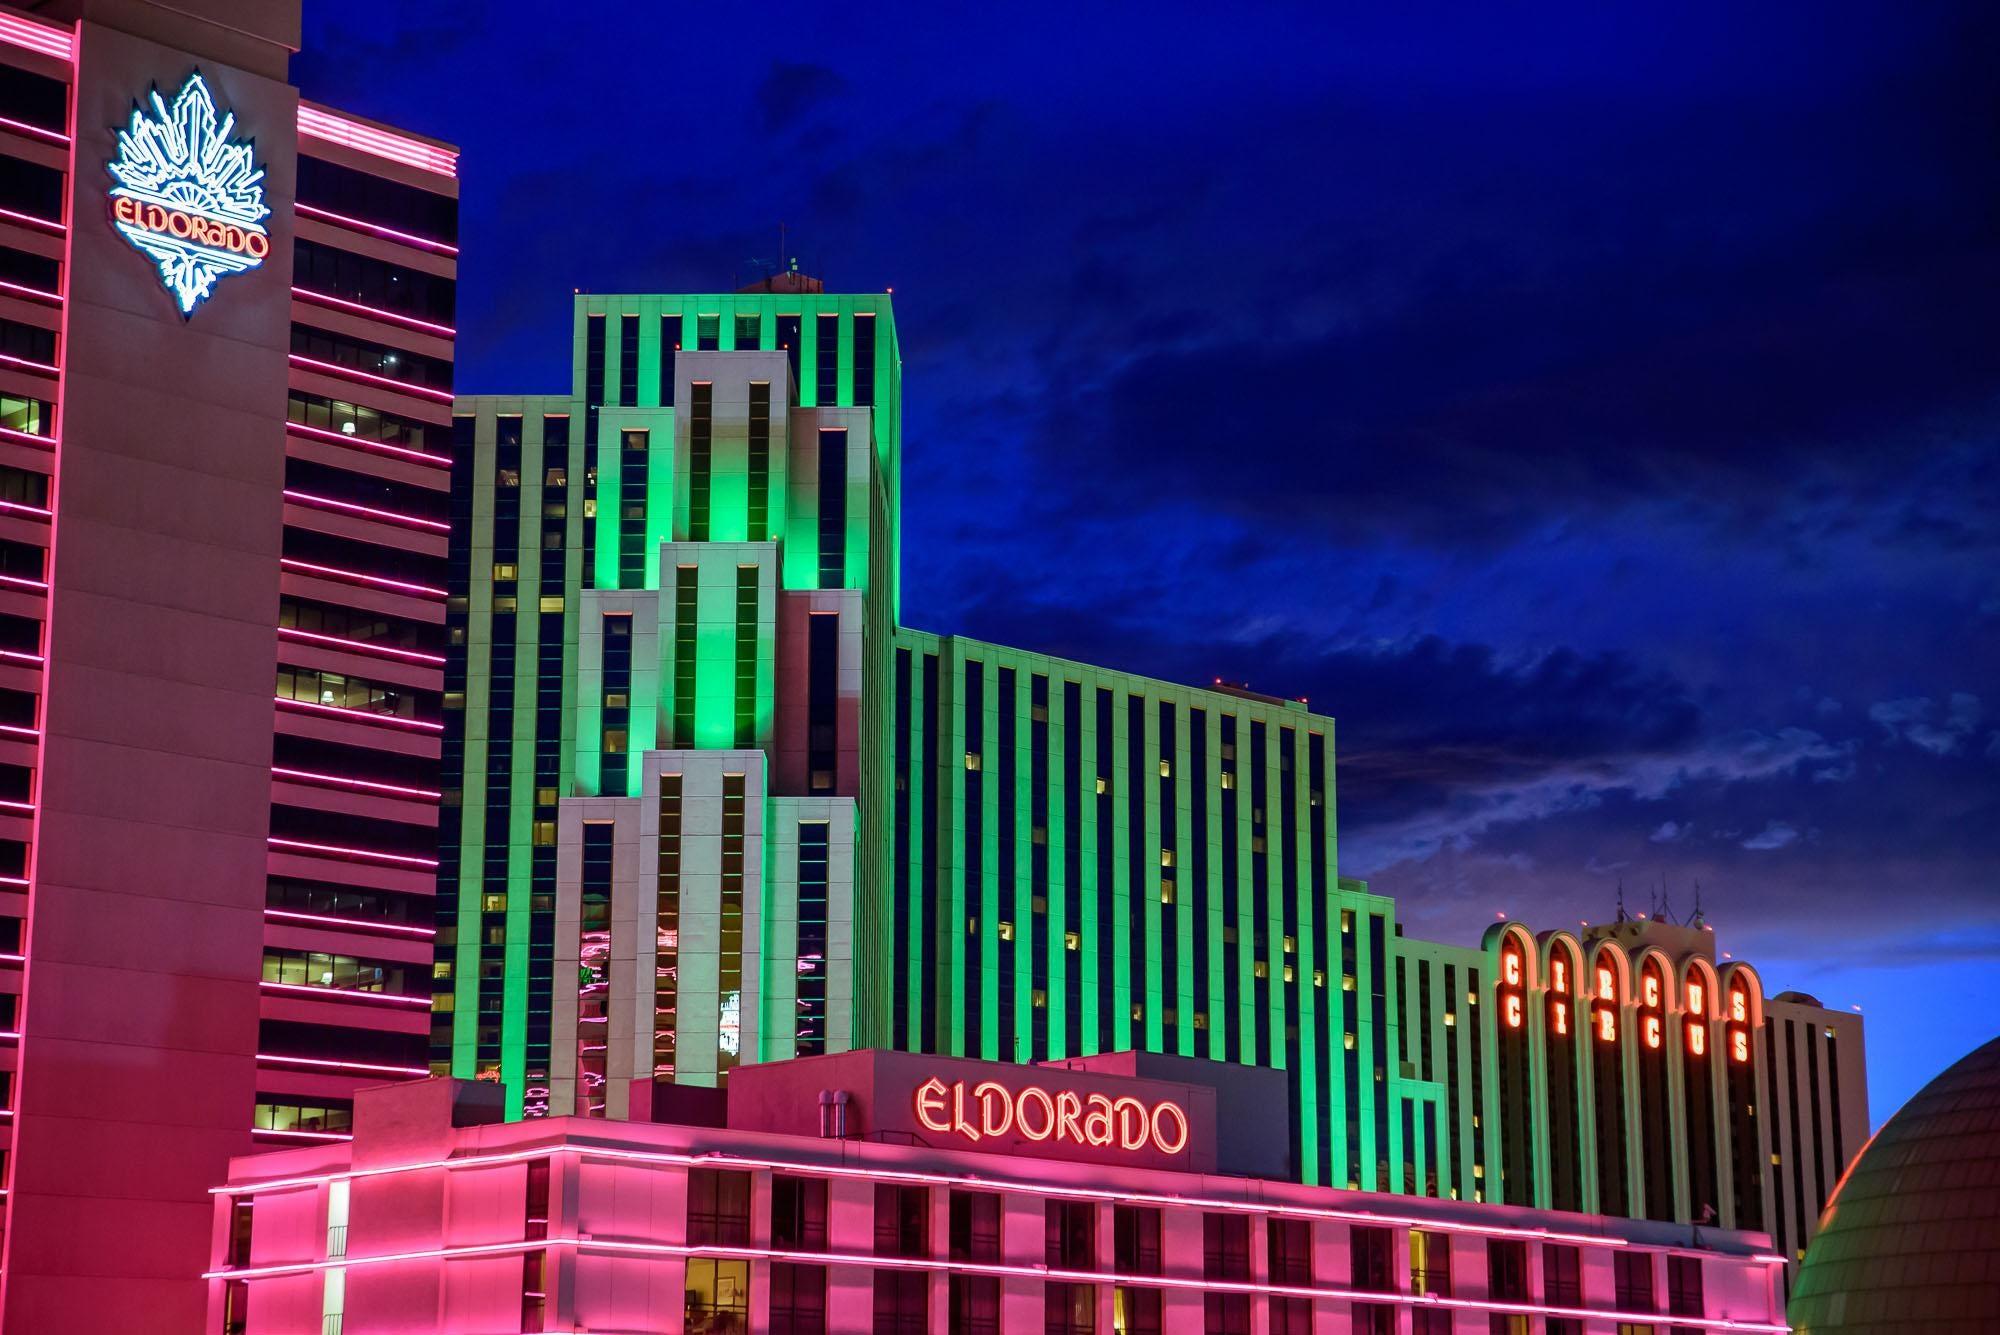 Eldorado will invest 4 million in the construction of new hypermarkets 63